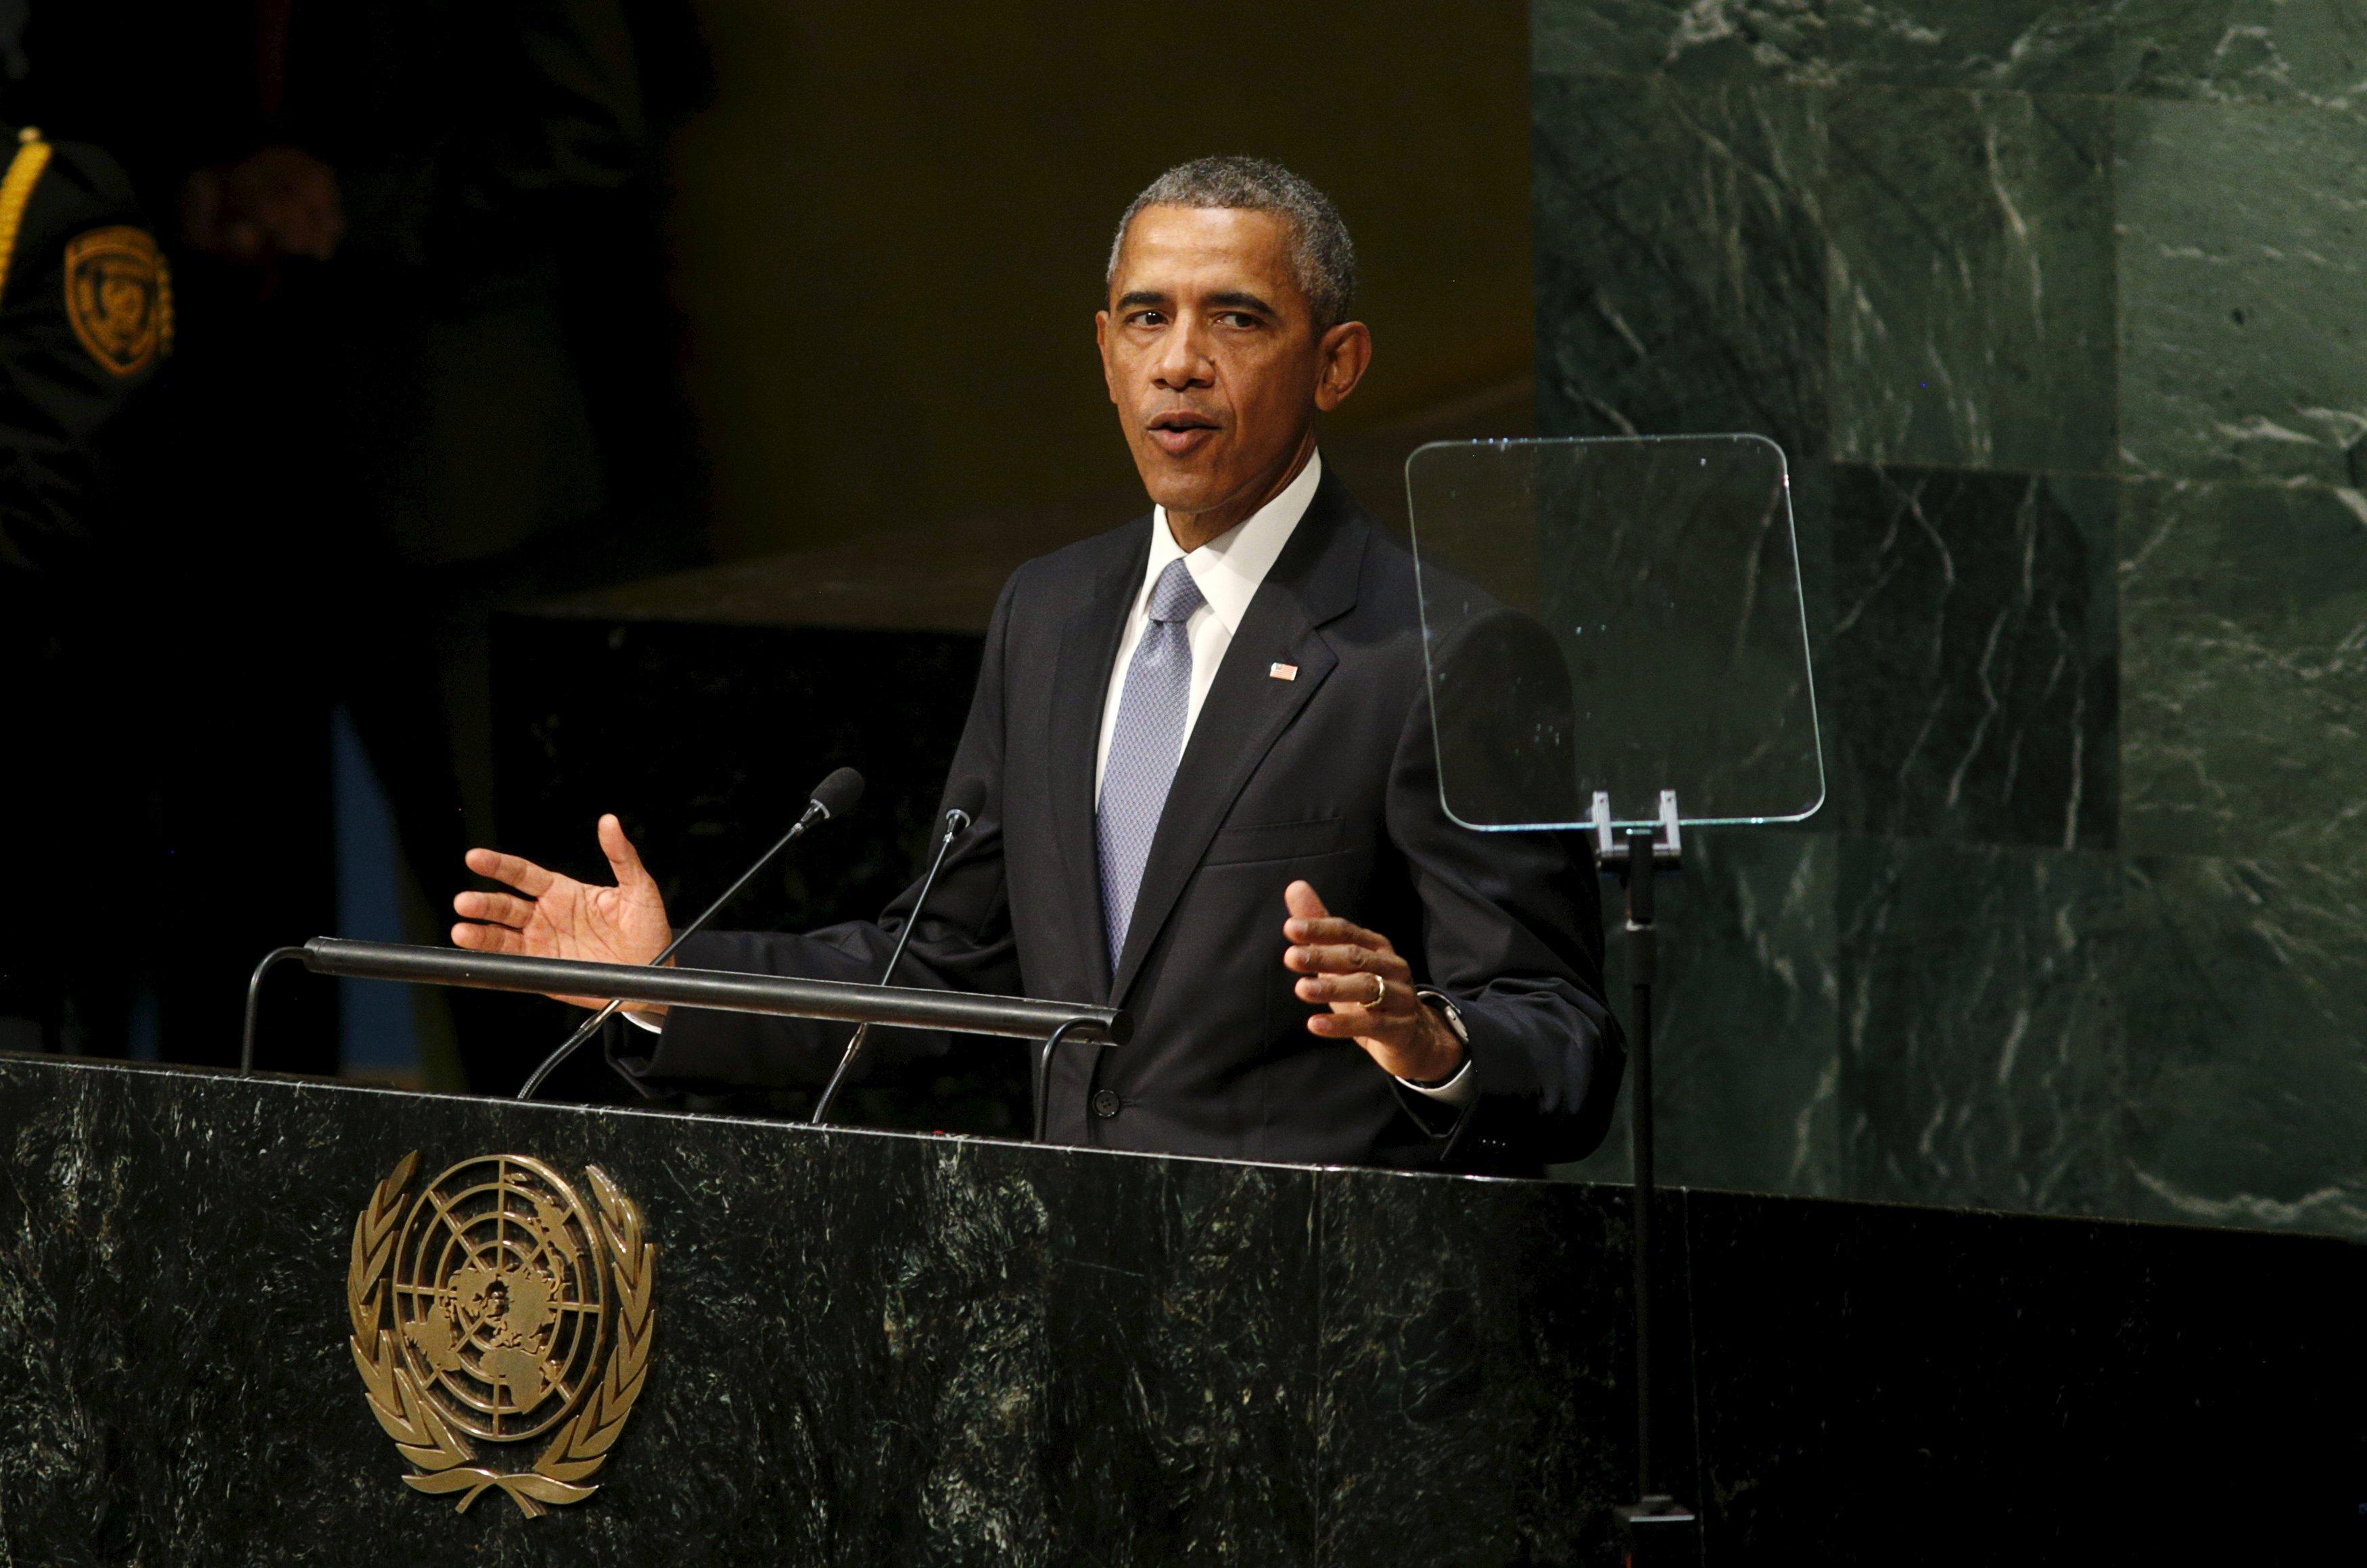 U.S. President Barack Obama addresses the United Nations General Assembly in New York September 28,  2015. REUTERS/Kevin Lamarque